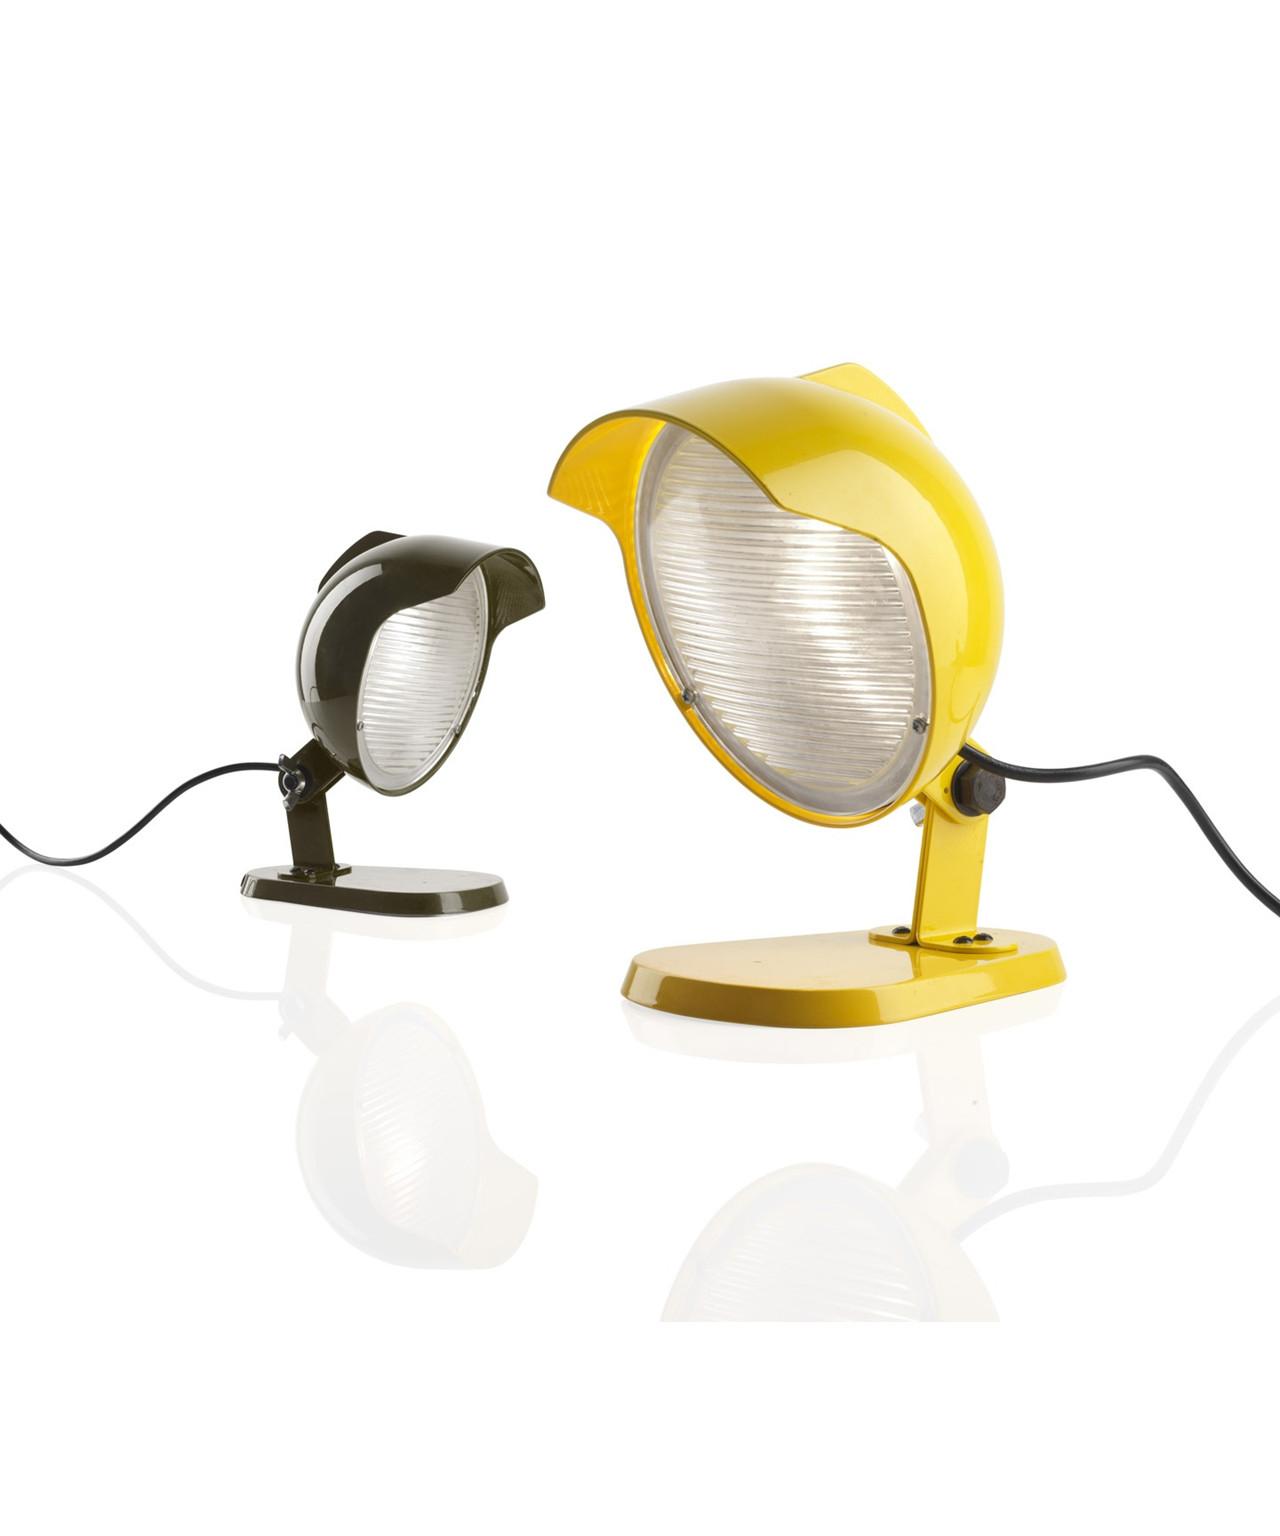 Duii mini væglampe/bordlampe grå